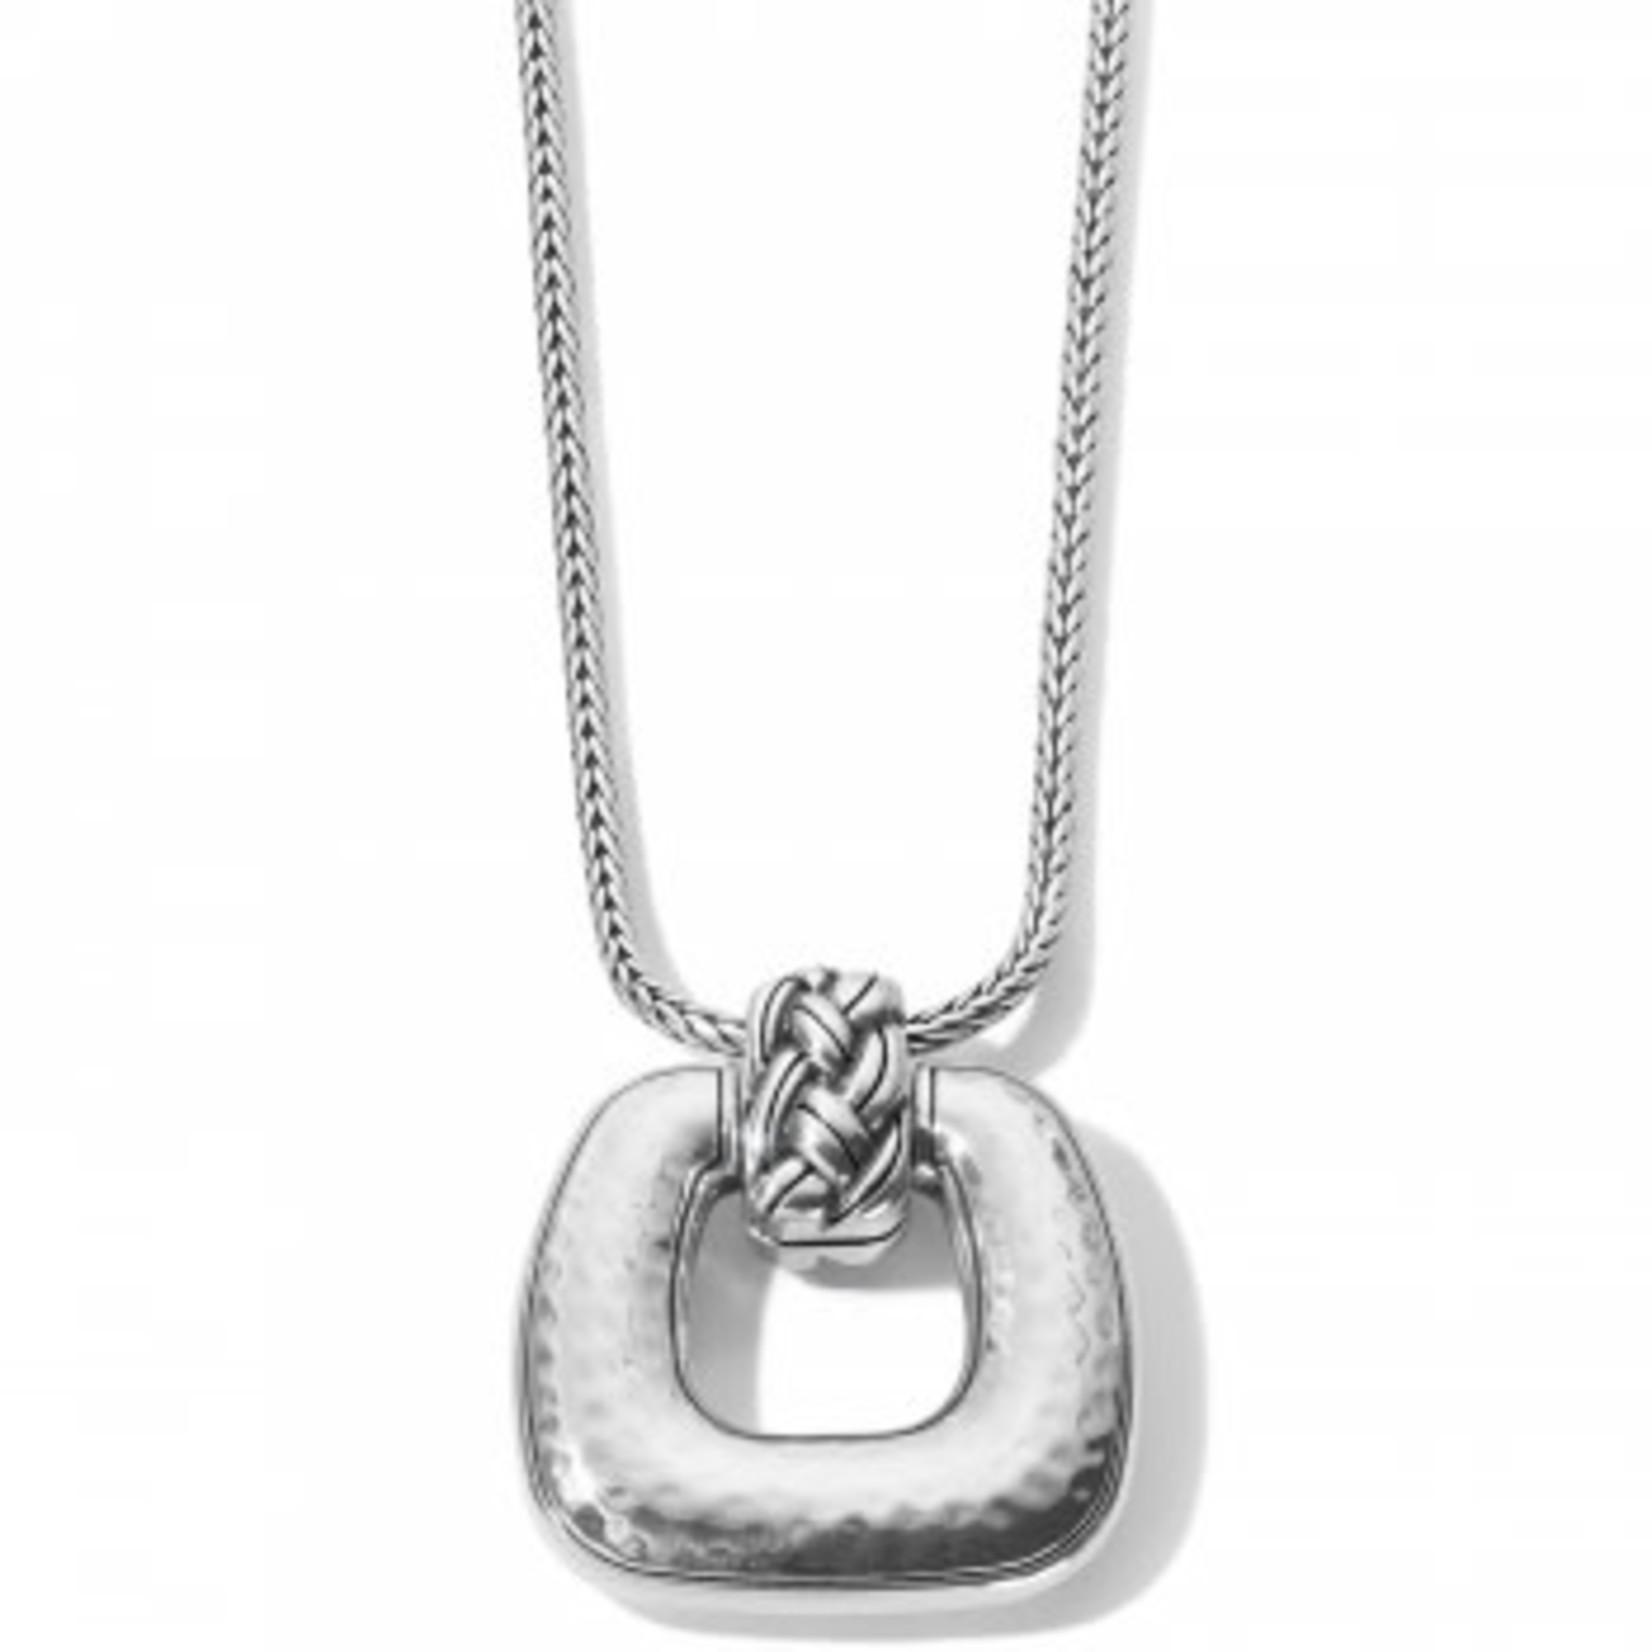 Brighton Interlok Woven Necklace Silver